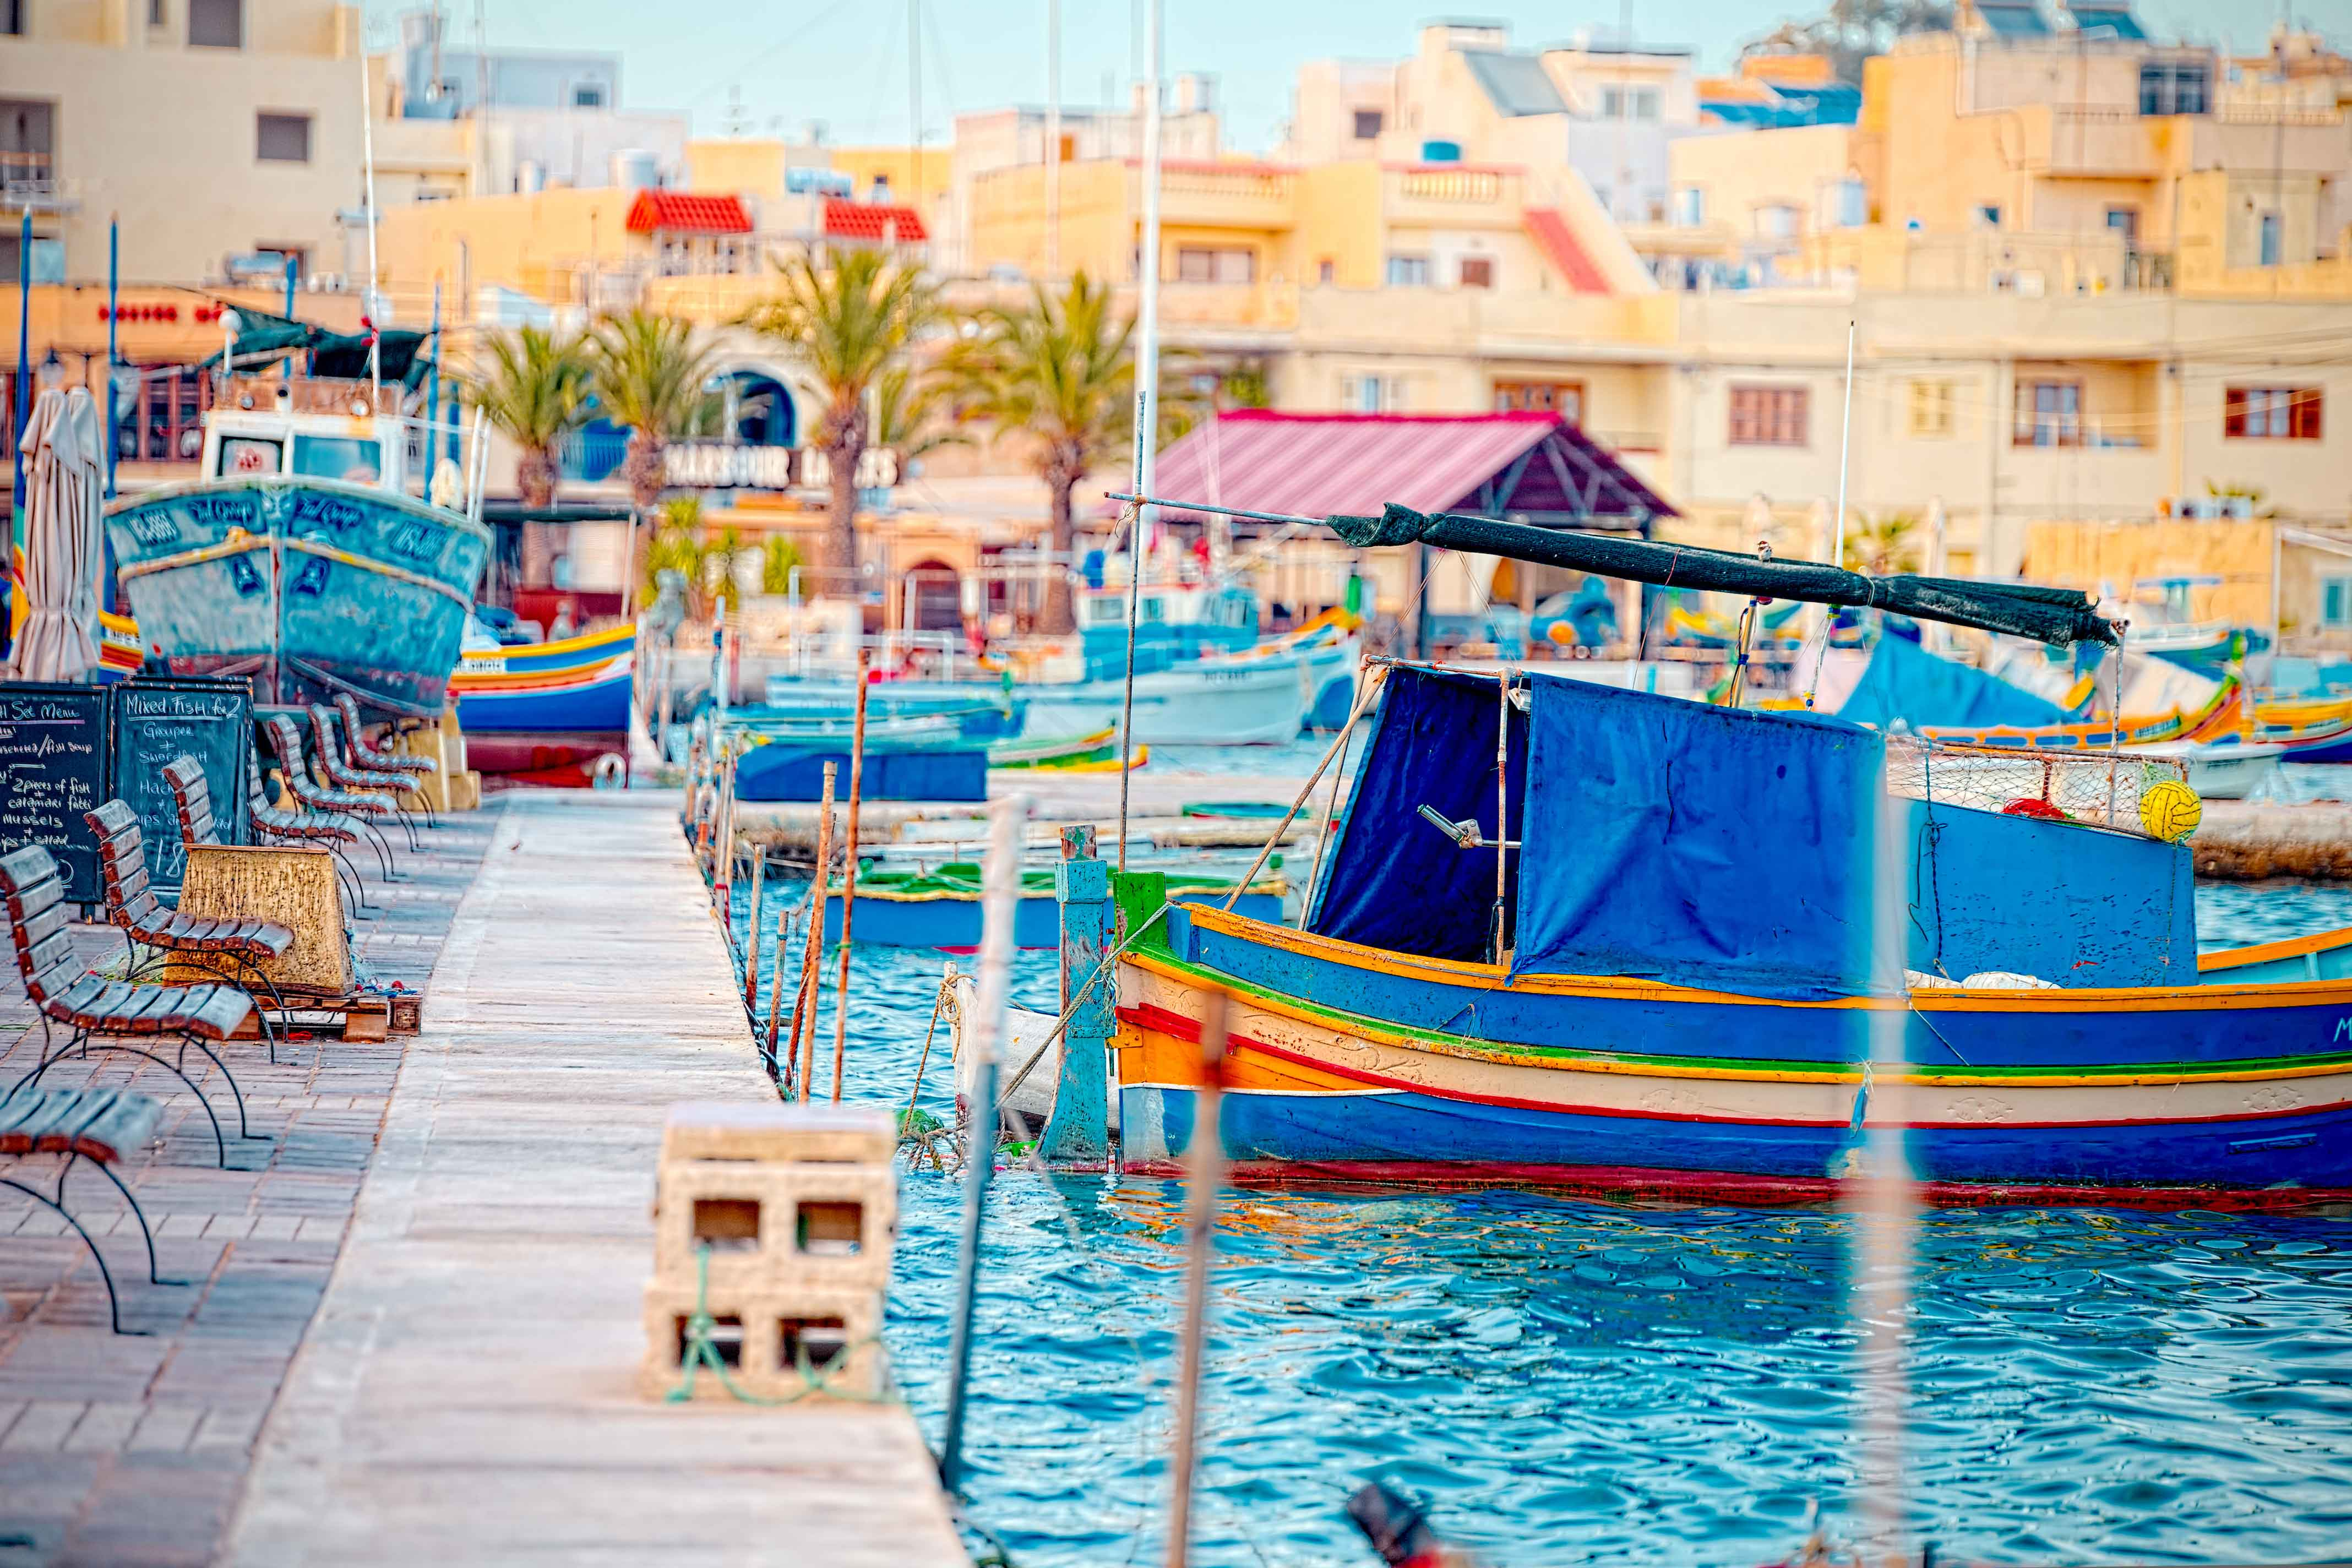 Canva---Luzzu-anchored-in-Malta,-at-the-port-of-Marsaxlokk